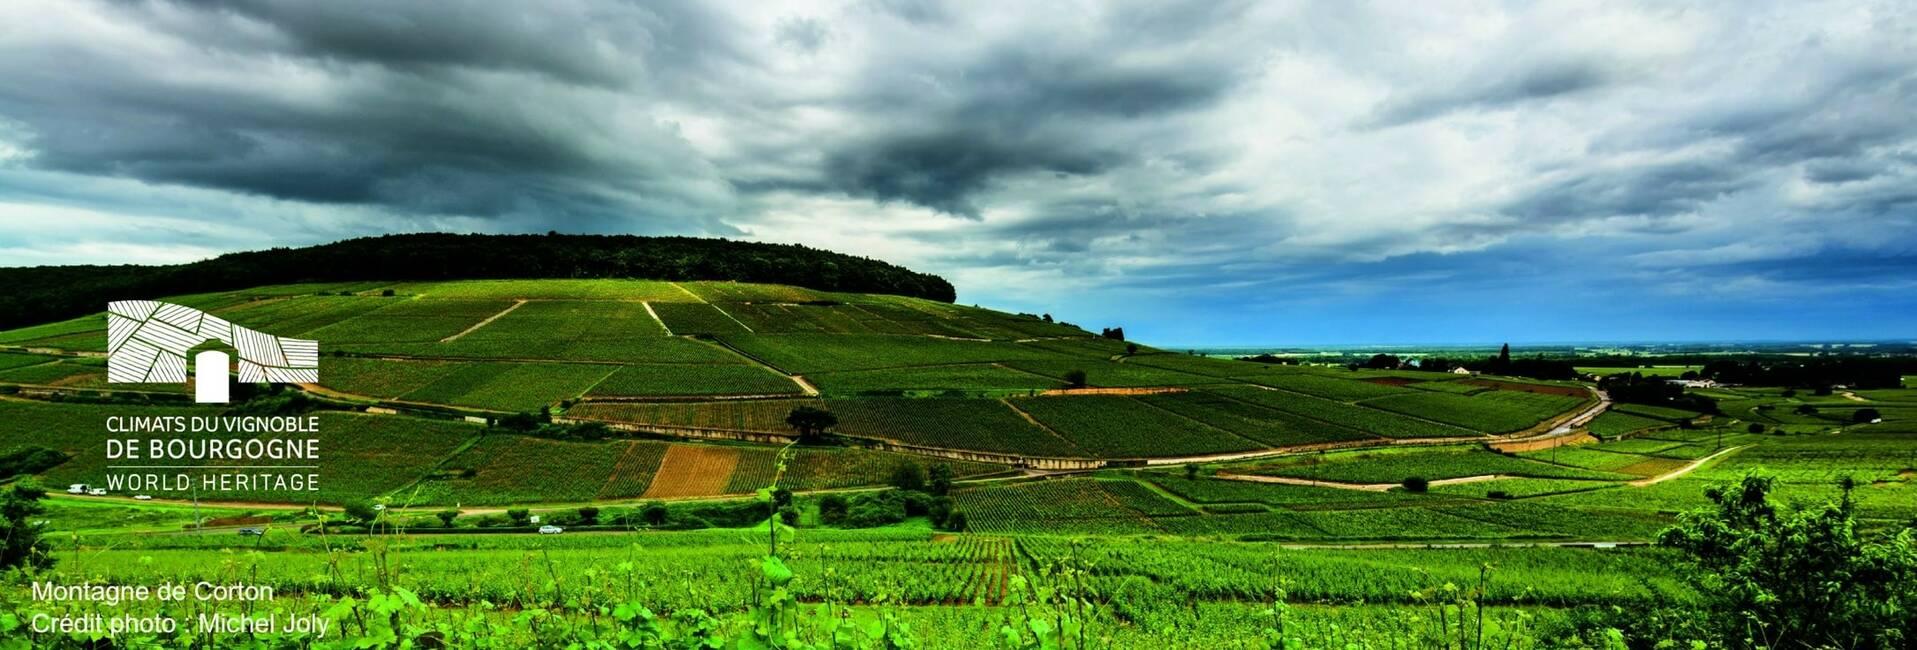 Montagne de Corton Bourgogne